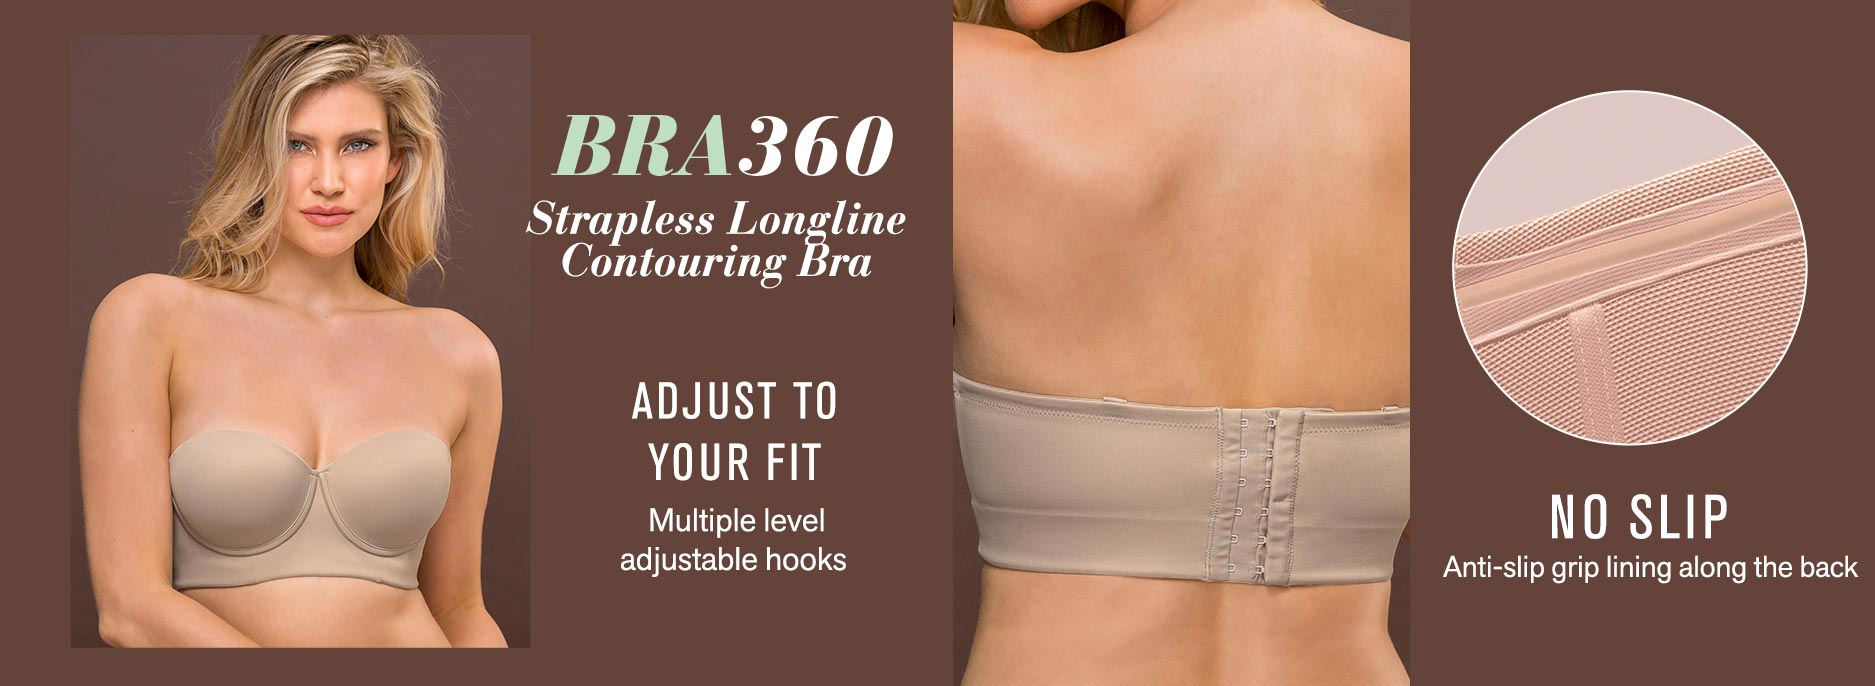 Bra 360: Strapless Longline Contouring Bra